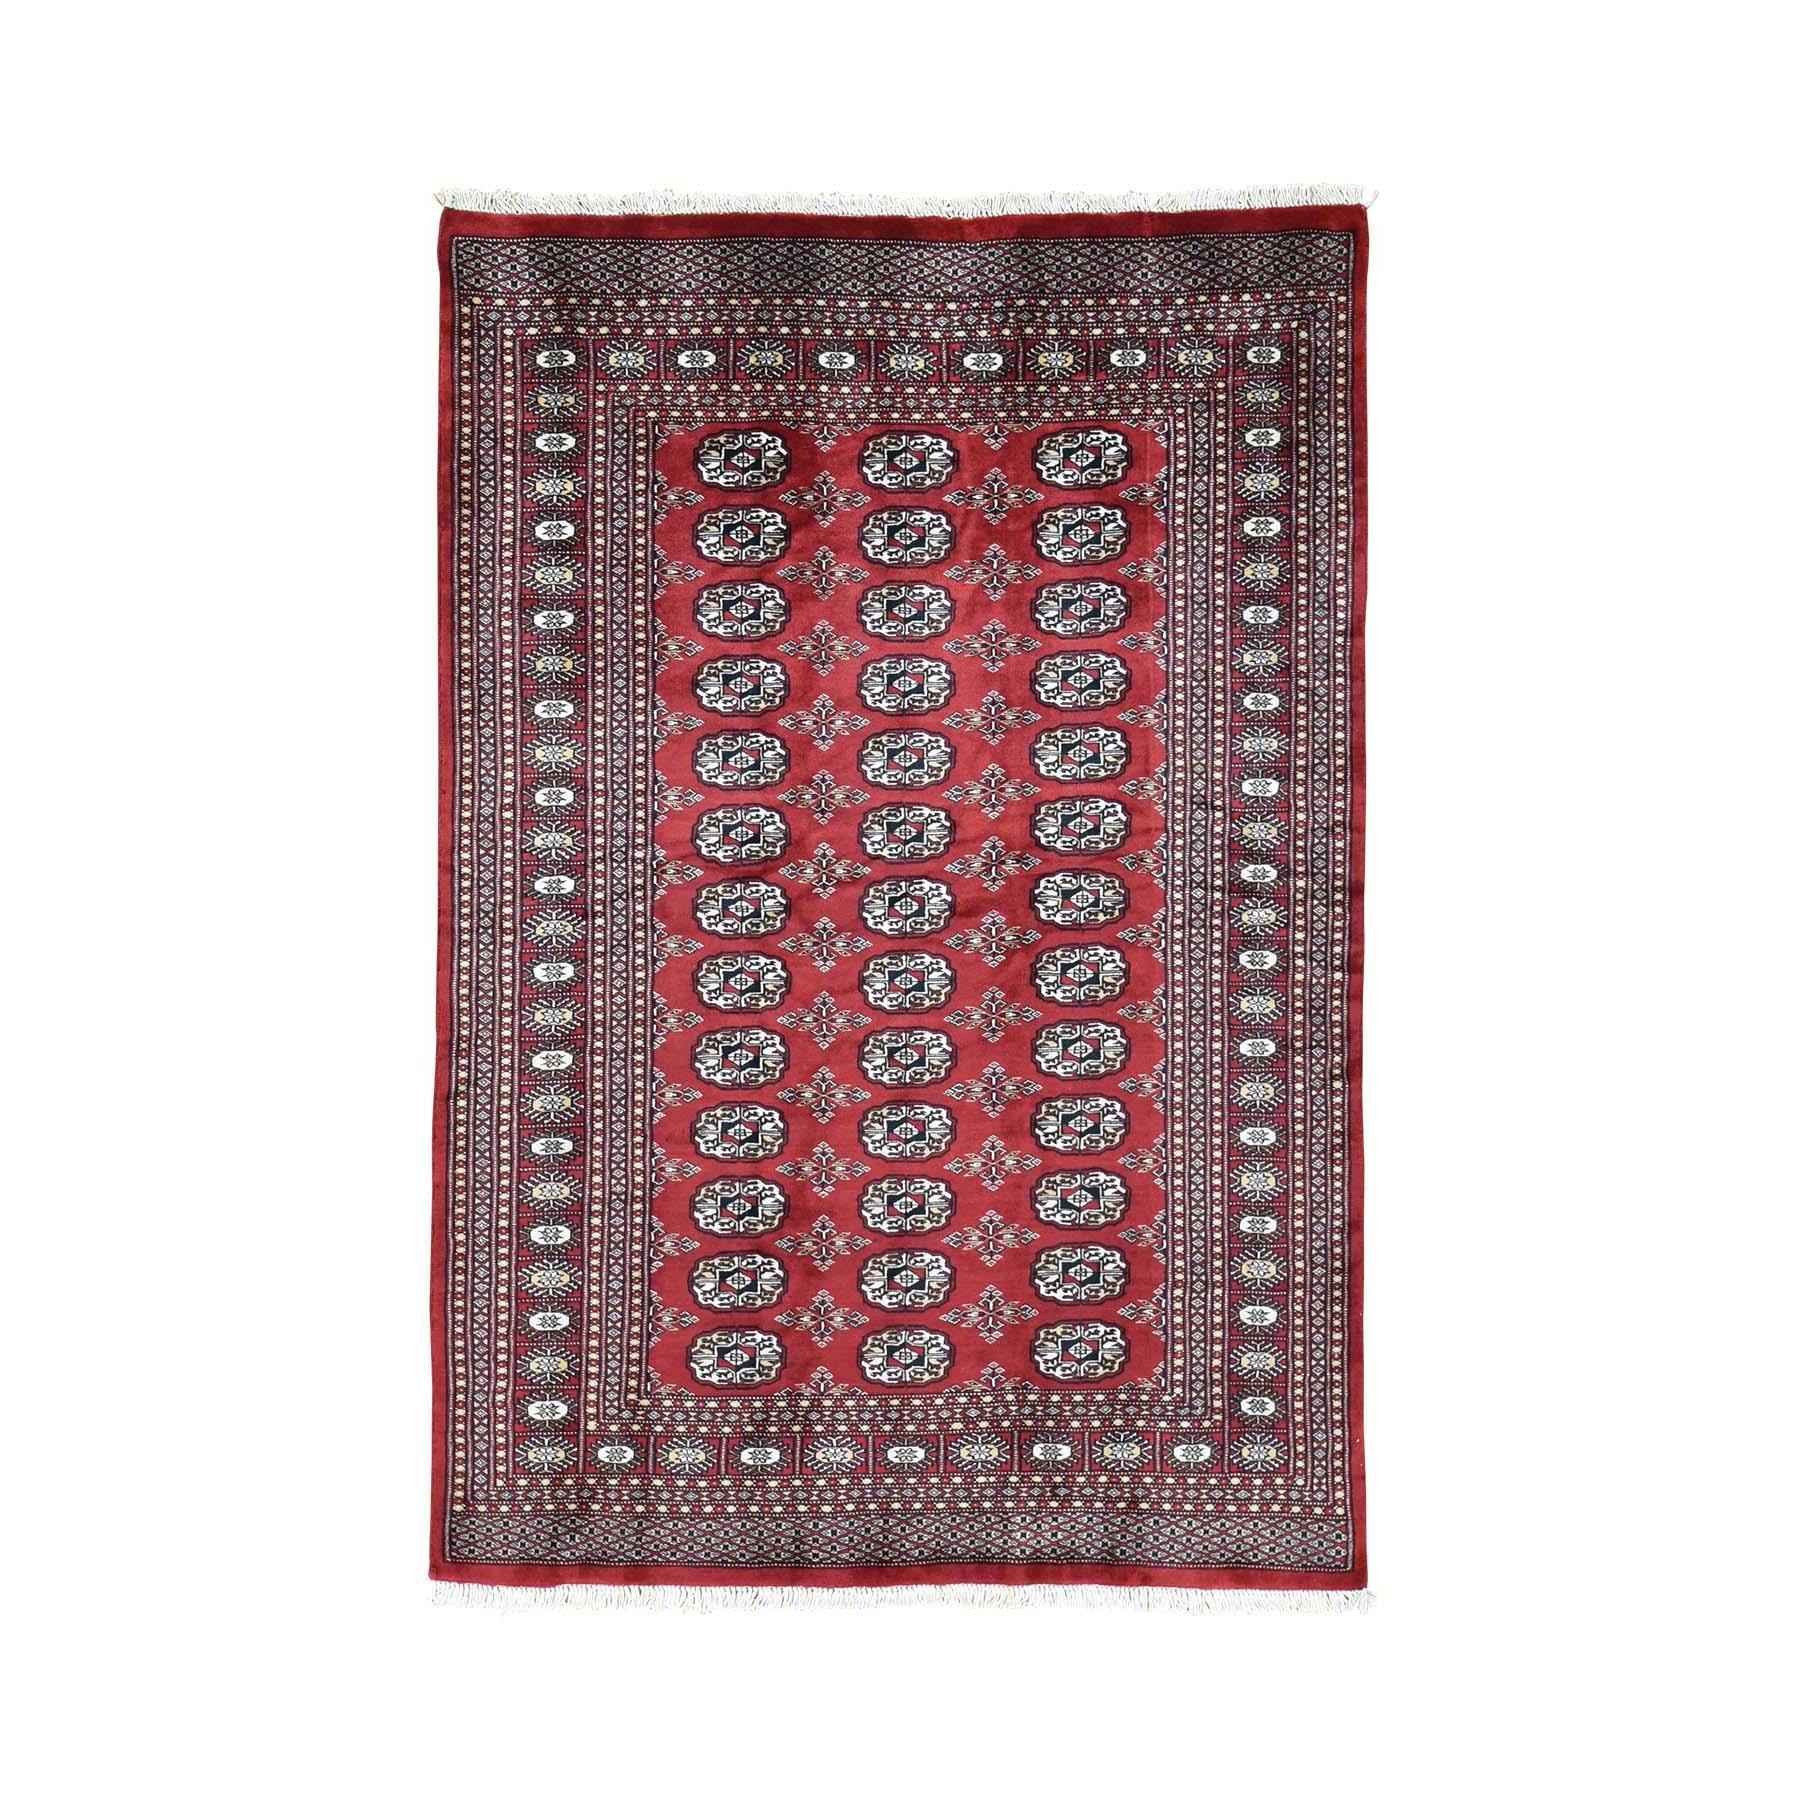 4'X6' Hand-Knotted High Quality Turkoman Bokara Pure Wool Oriental Rug moac06cb